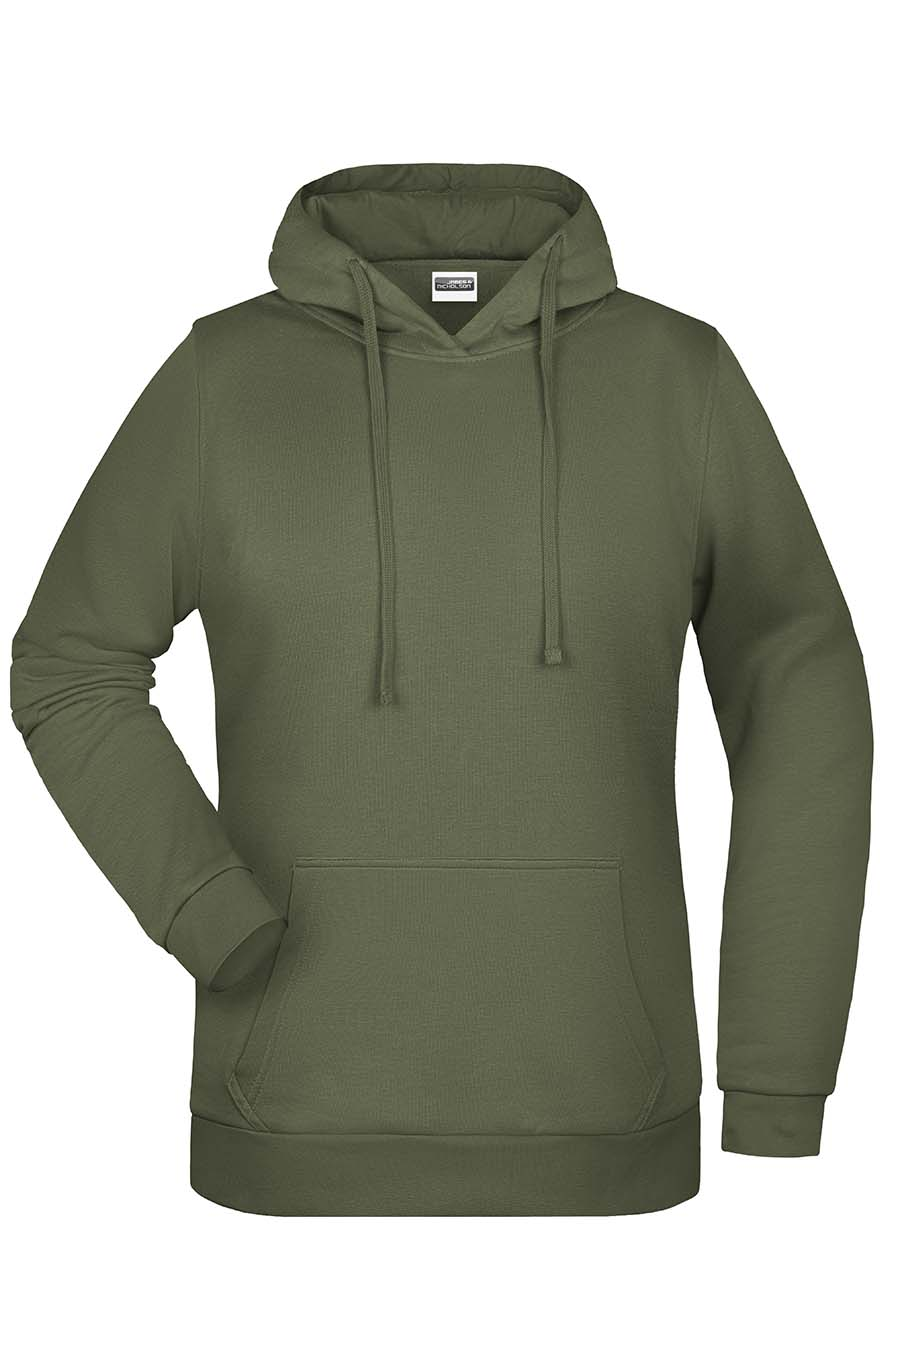 Sweat-shirt capuche femme - 20-1494-13